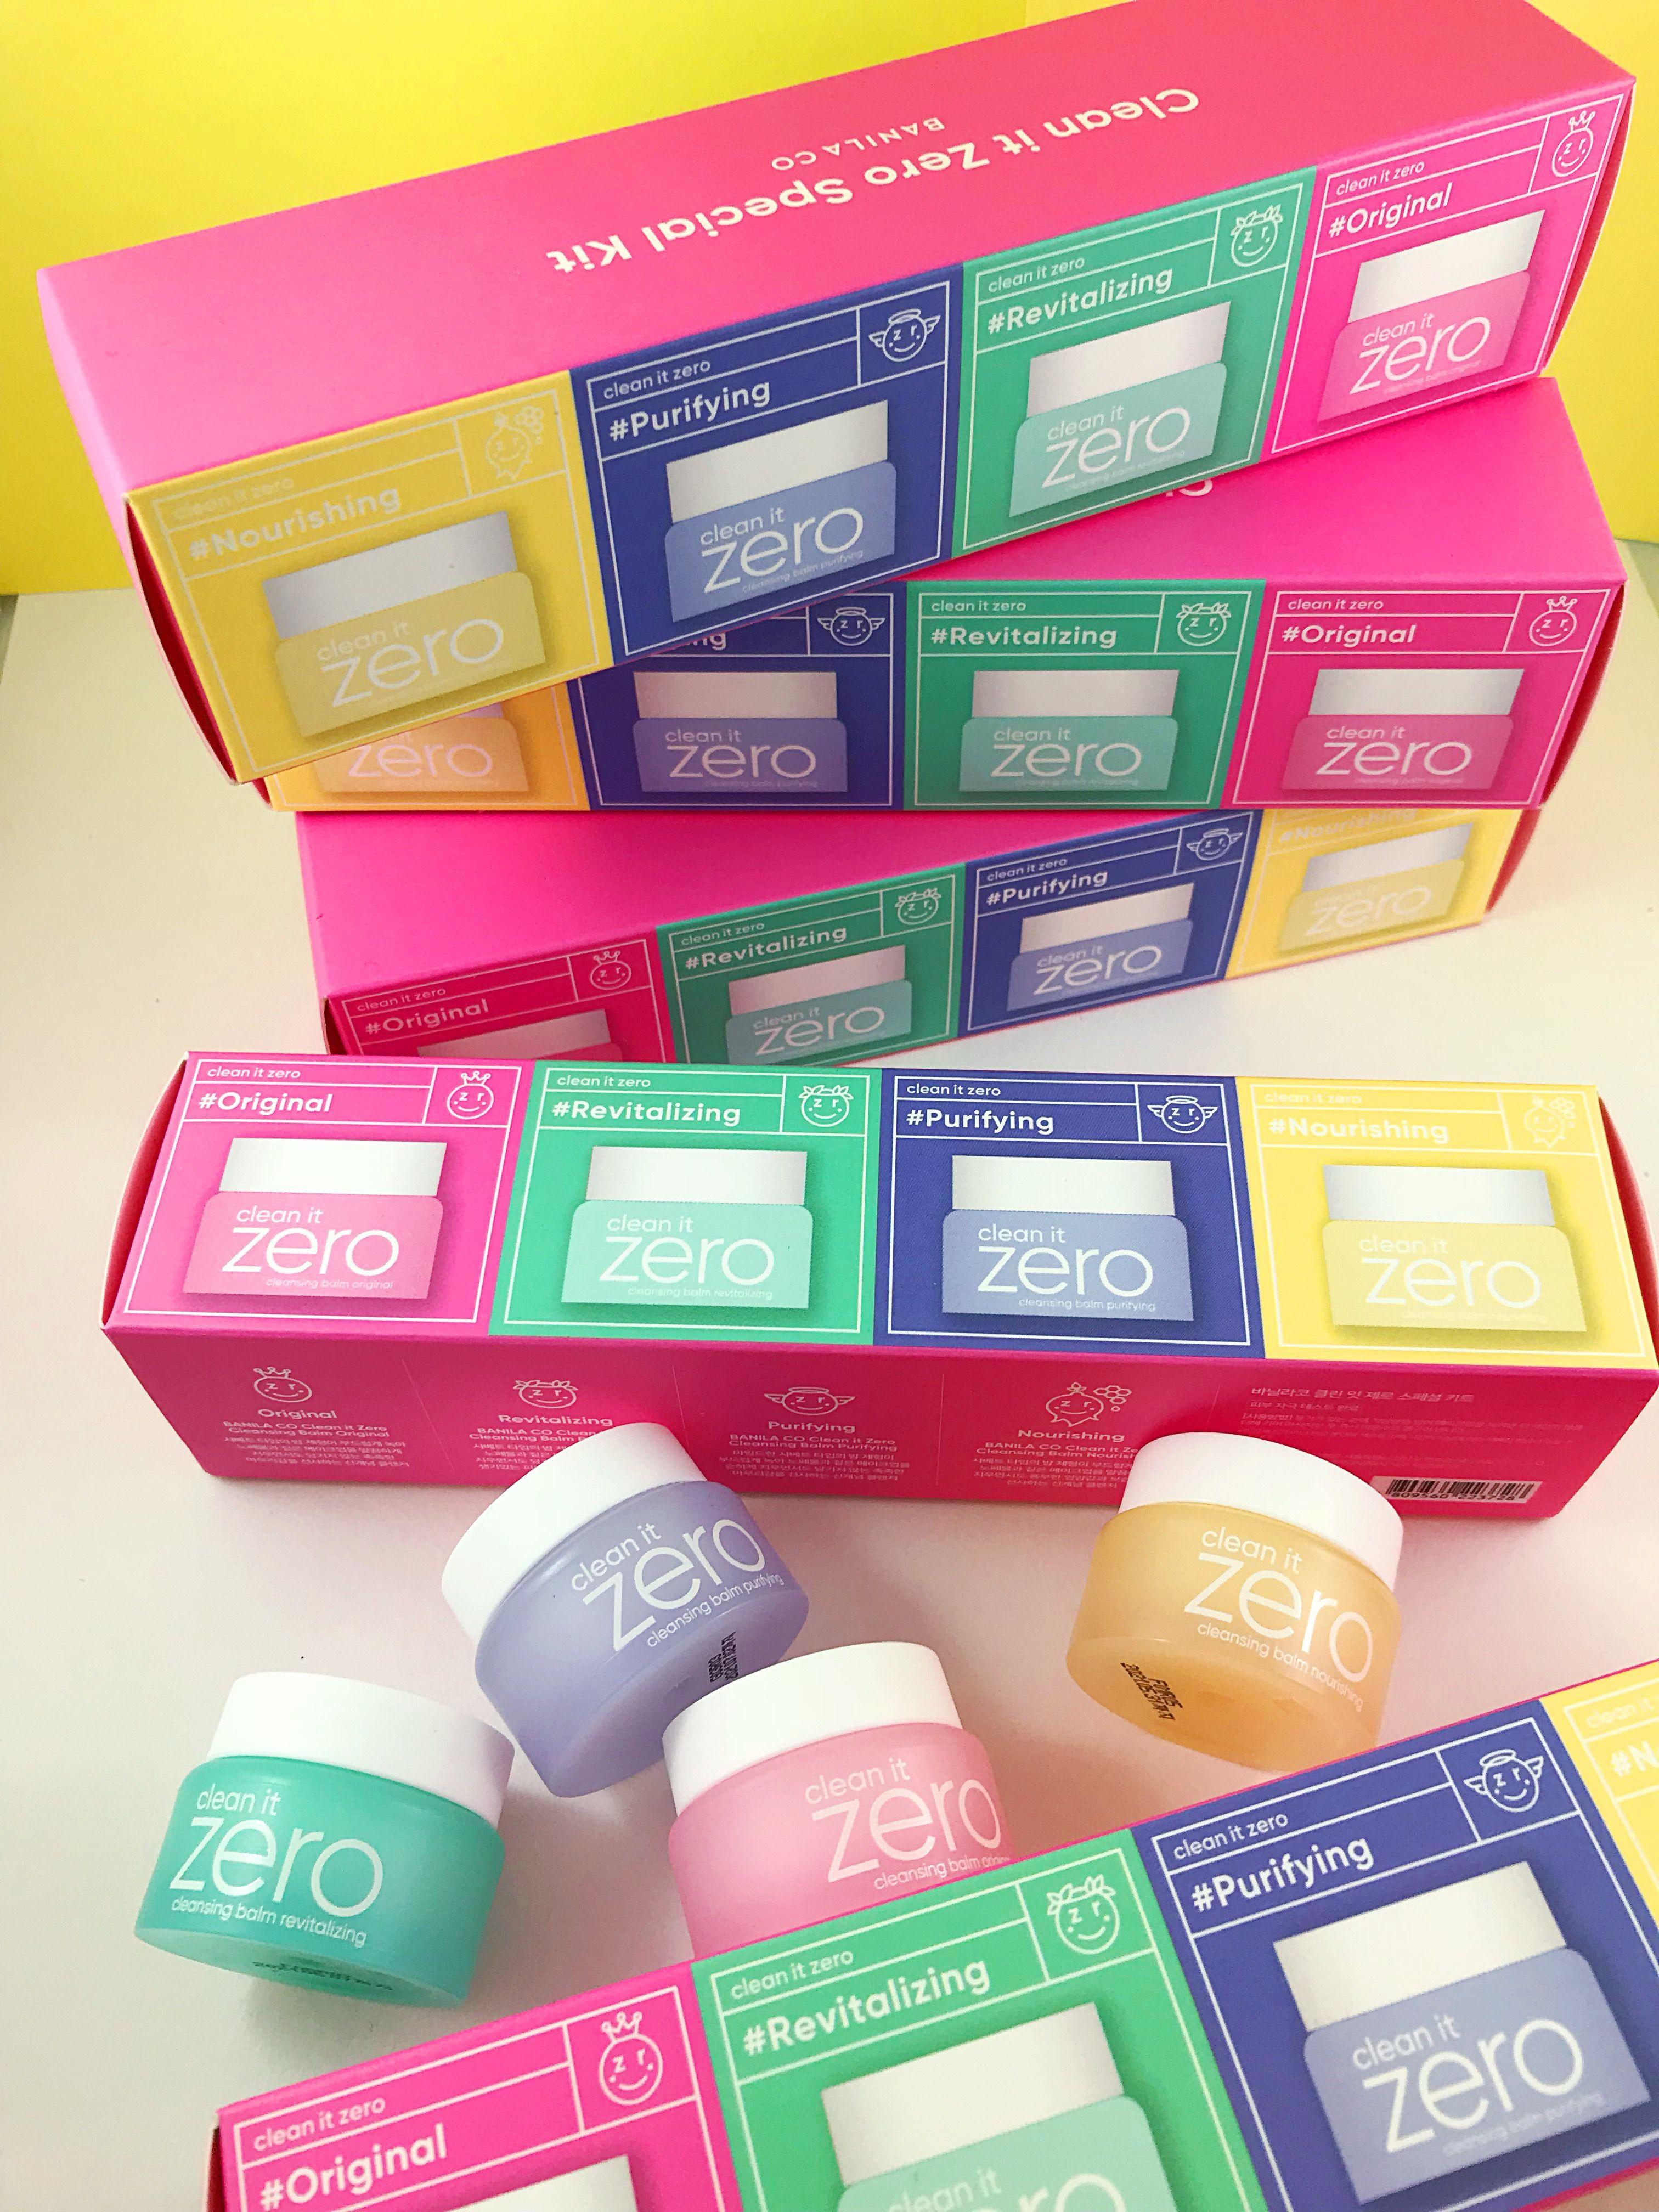 Banila Clean It Zero Special Kit Shop it at Skin care